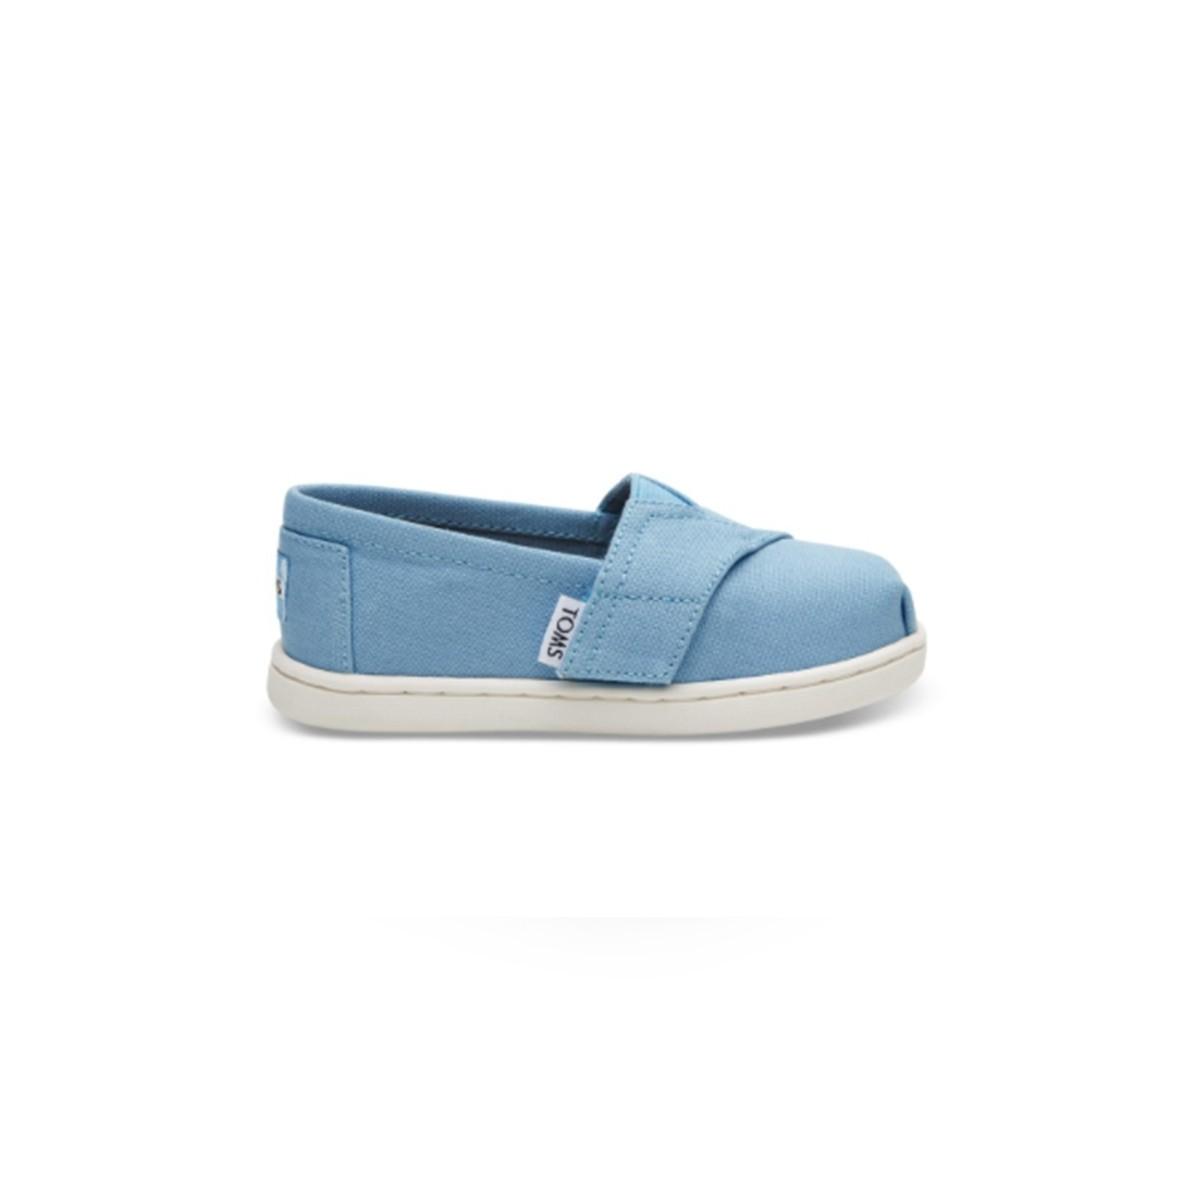 Chaussure toile bleu ciel velcro kids